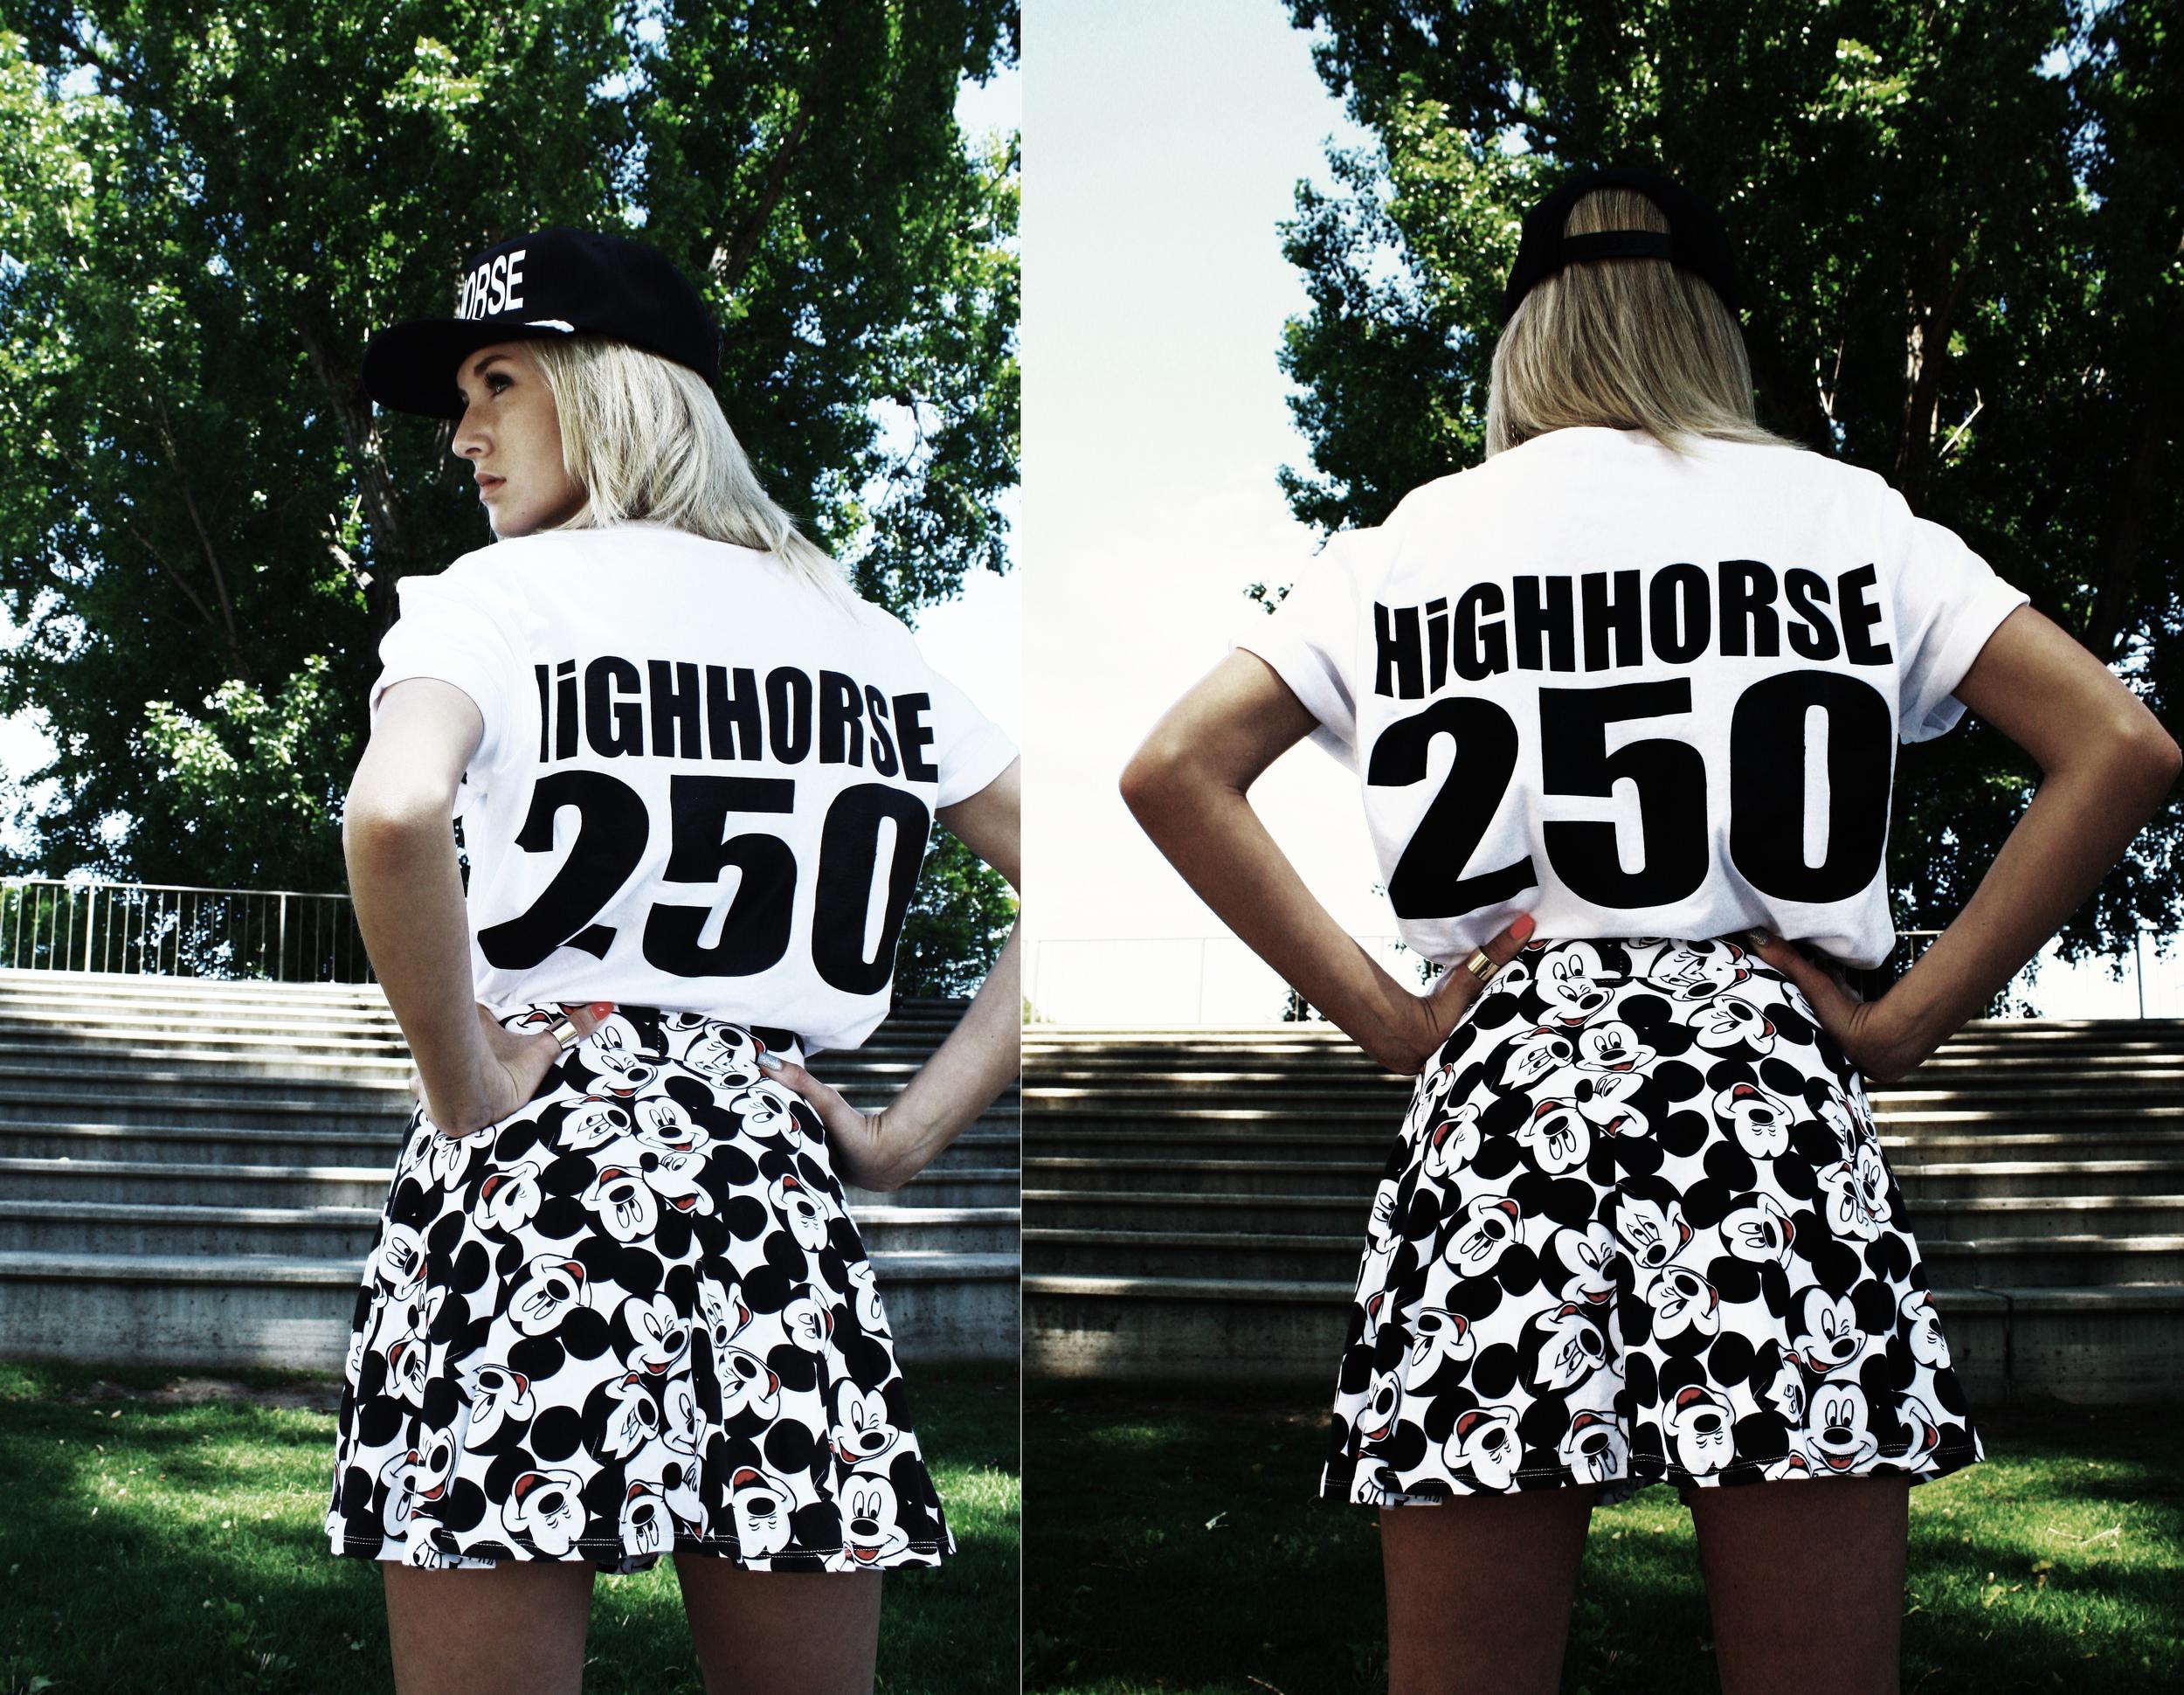 HiGHHORSE X WOLFETTE STYLiNG